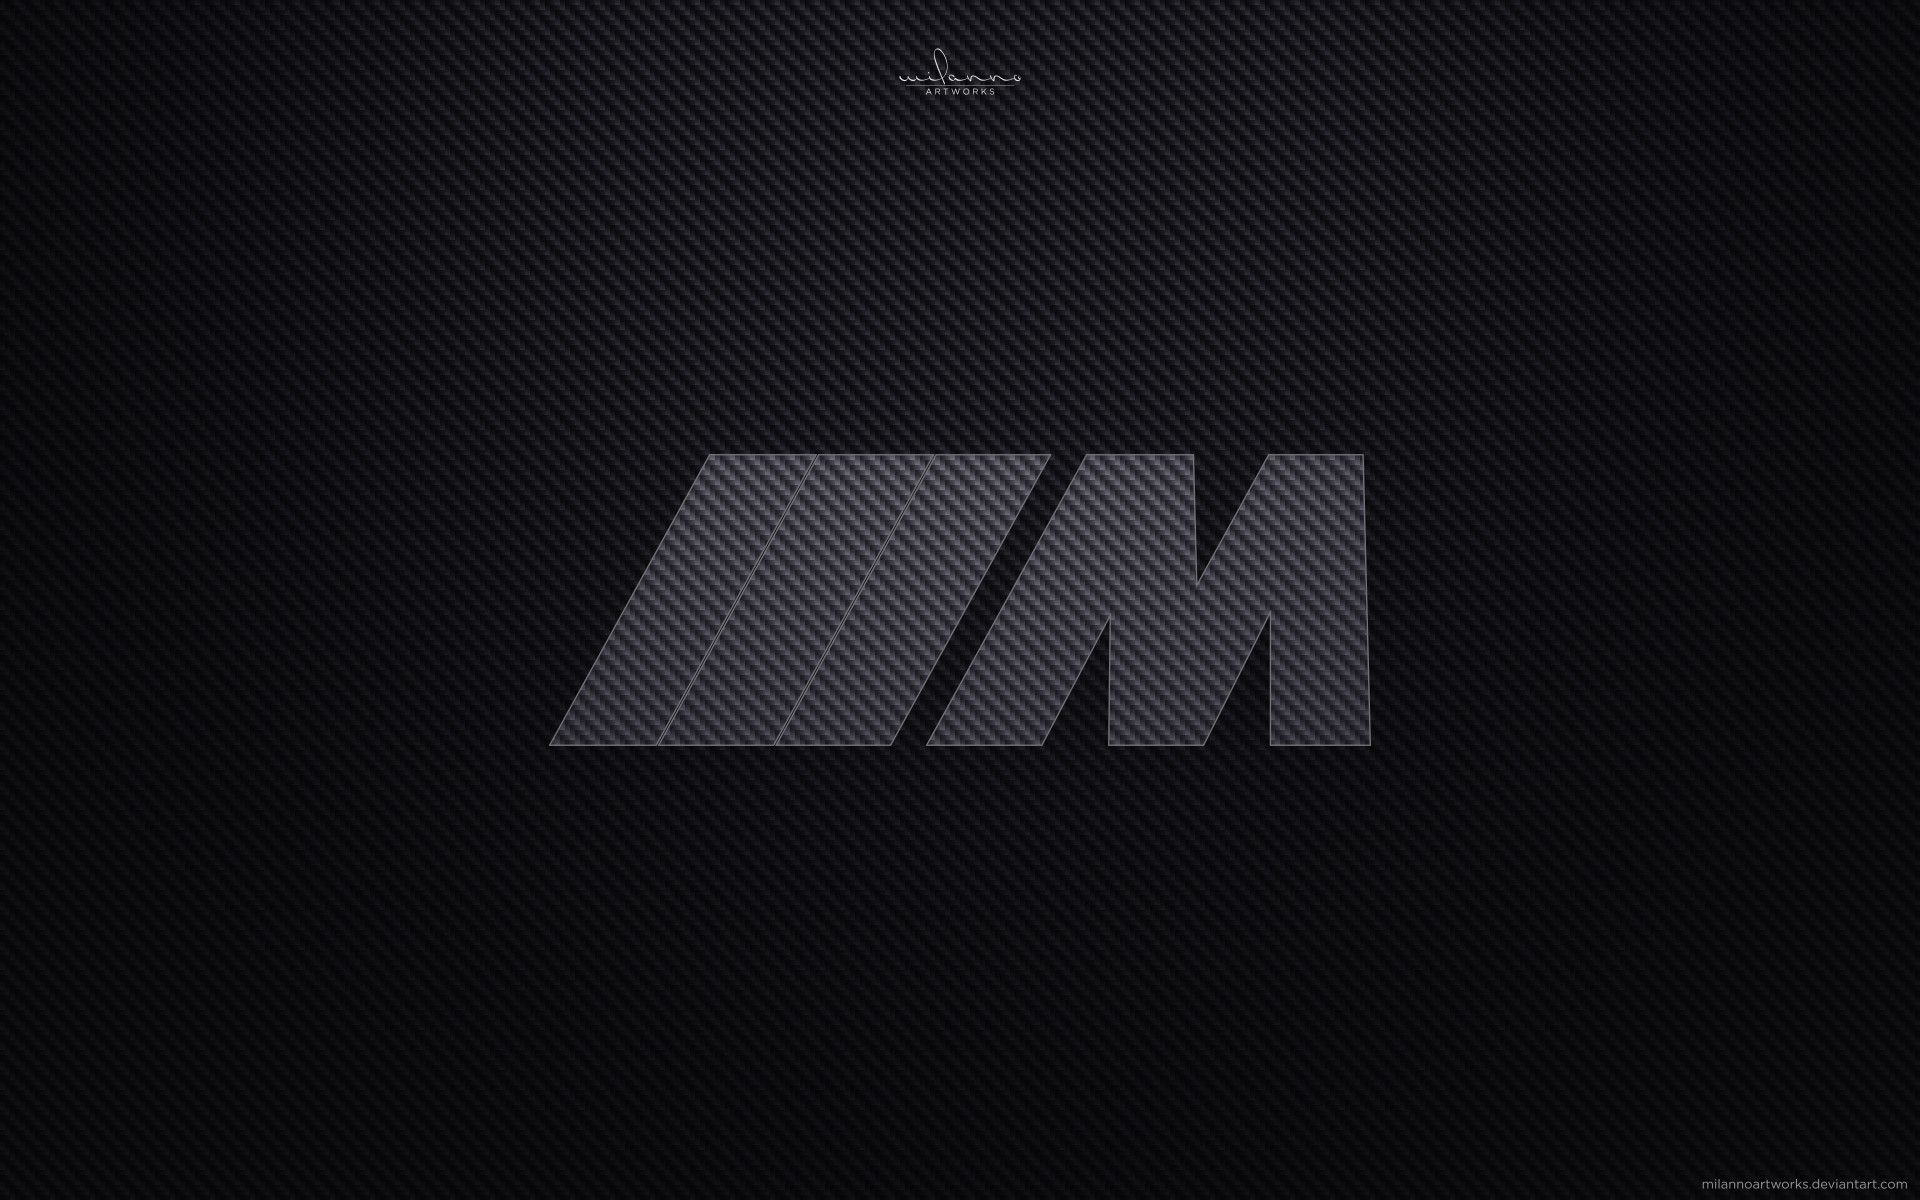 Bmw M Sport Wallpaper Iphone: [72+] Bmw M Logo Wallpaper On WallpaperSafari